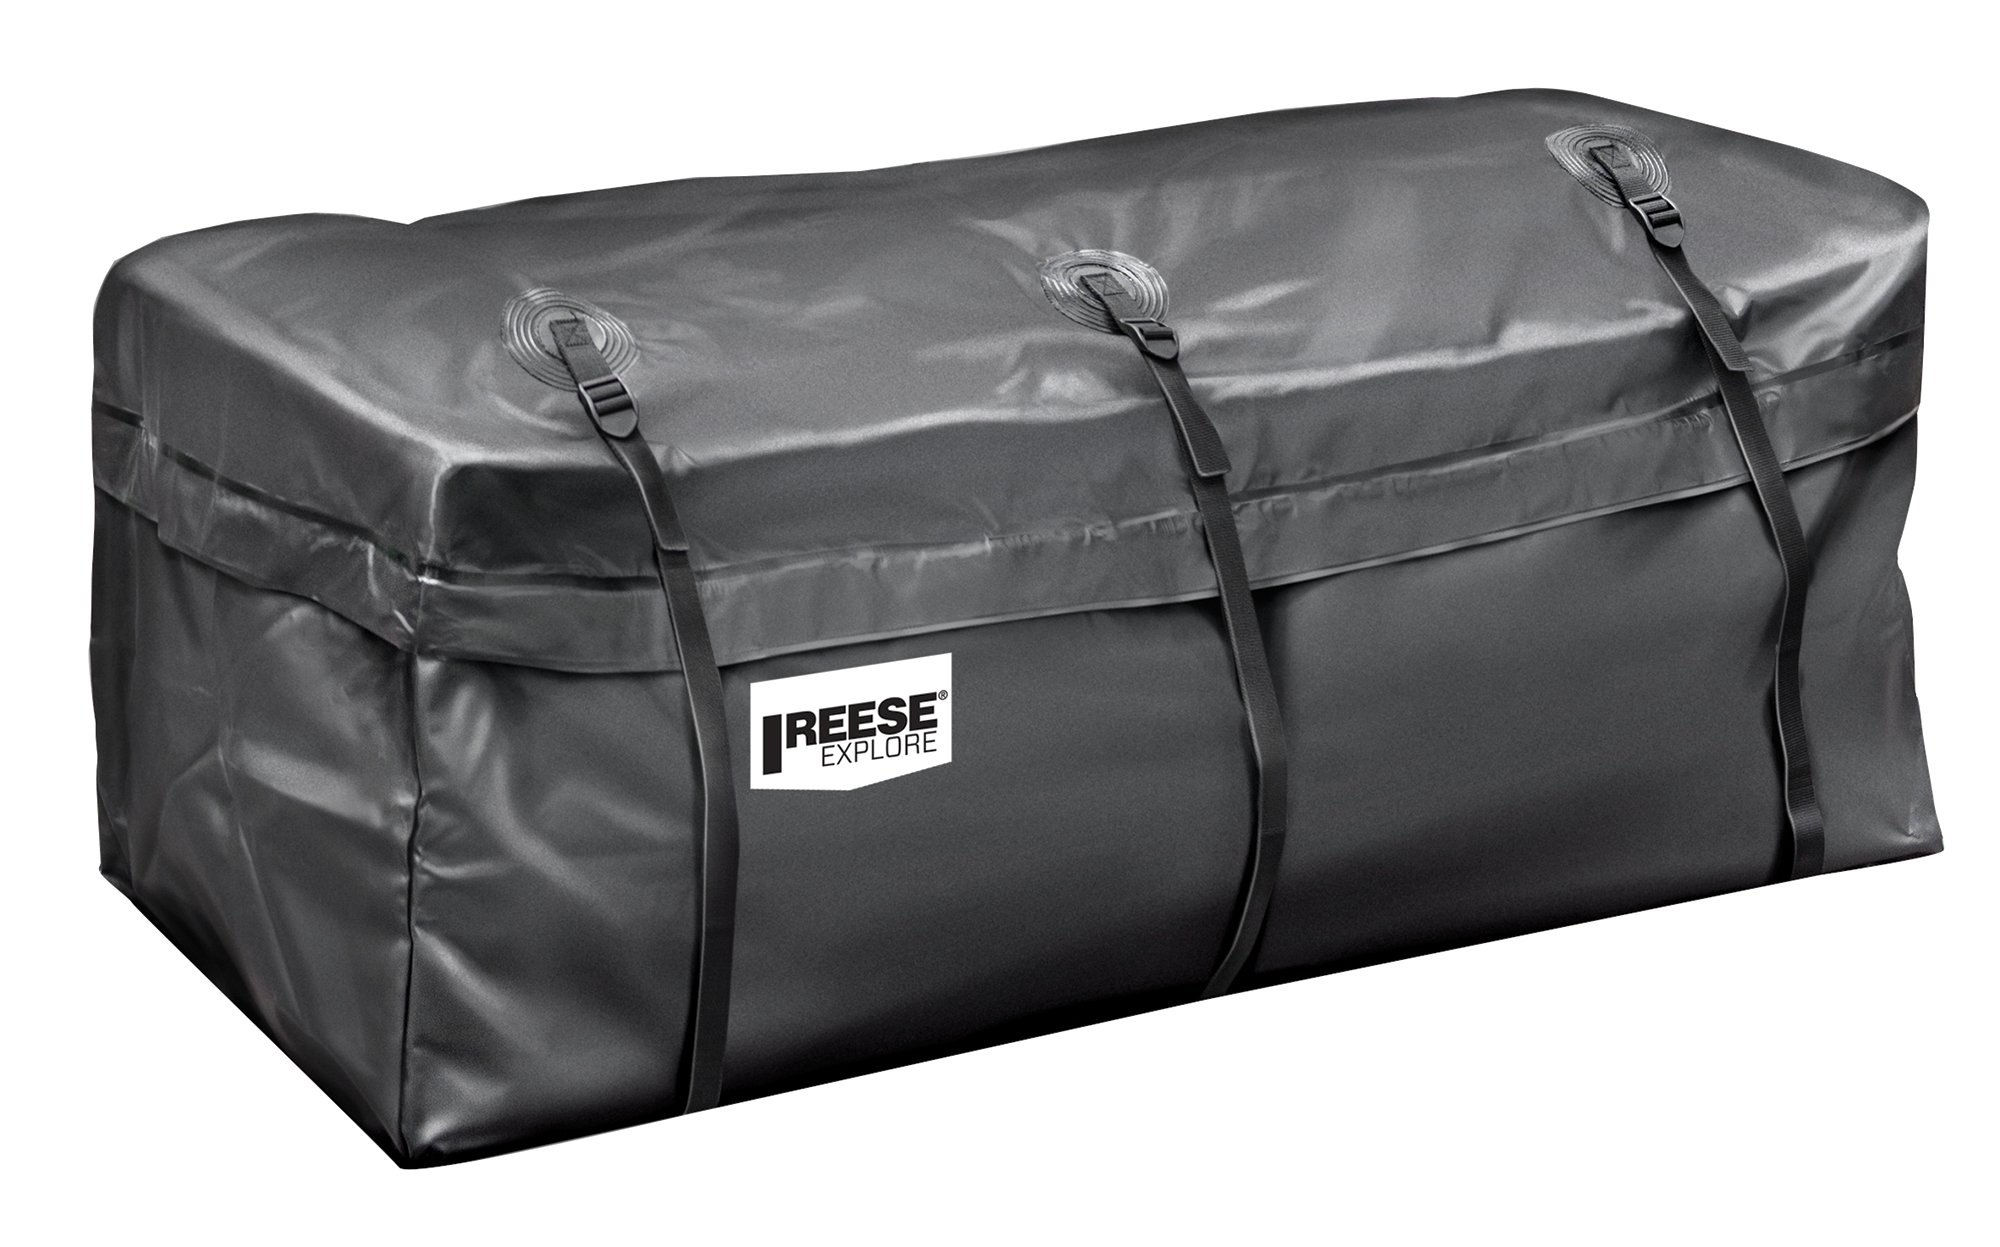 Reese Explore 1043000 Rainproof Cargo Tray Bag